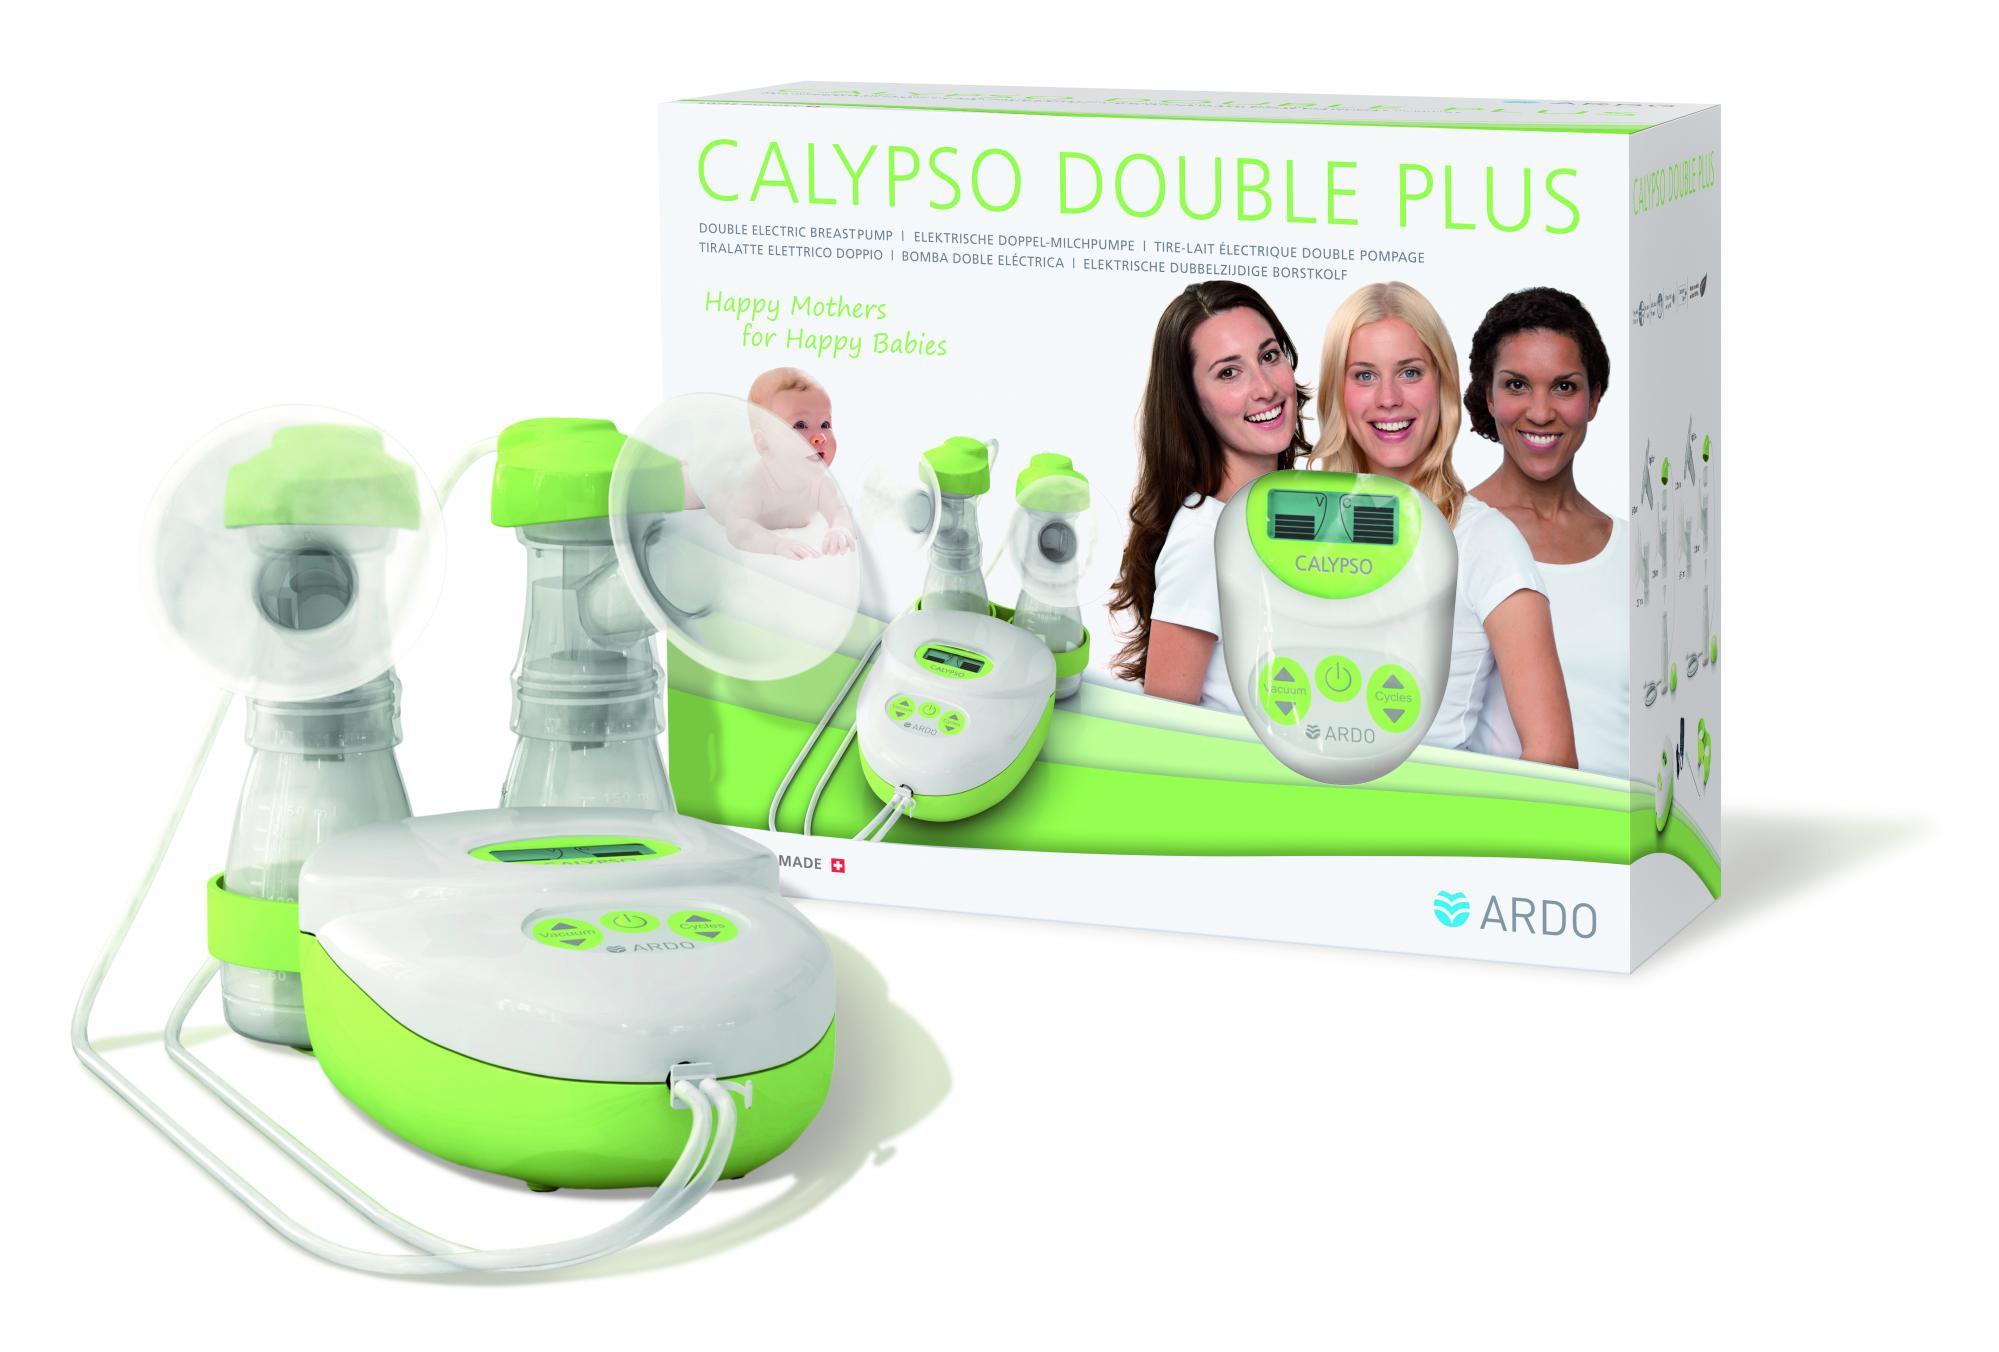 ardo-calypso-double-plus-package-2.jpg